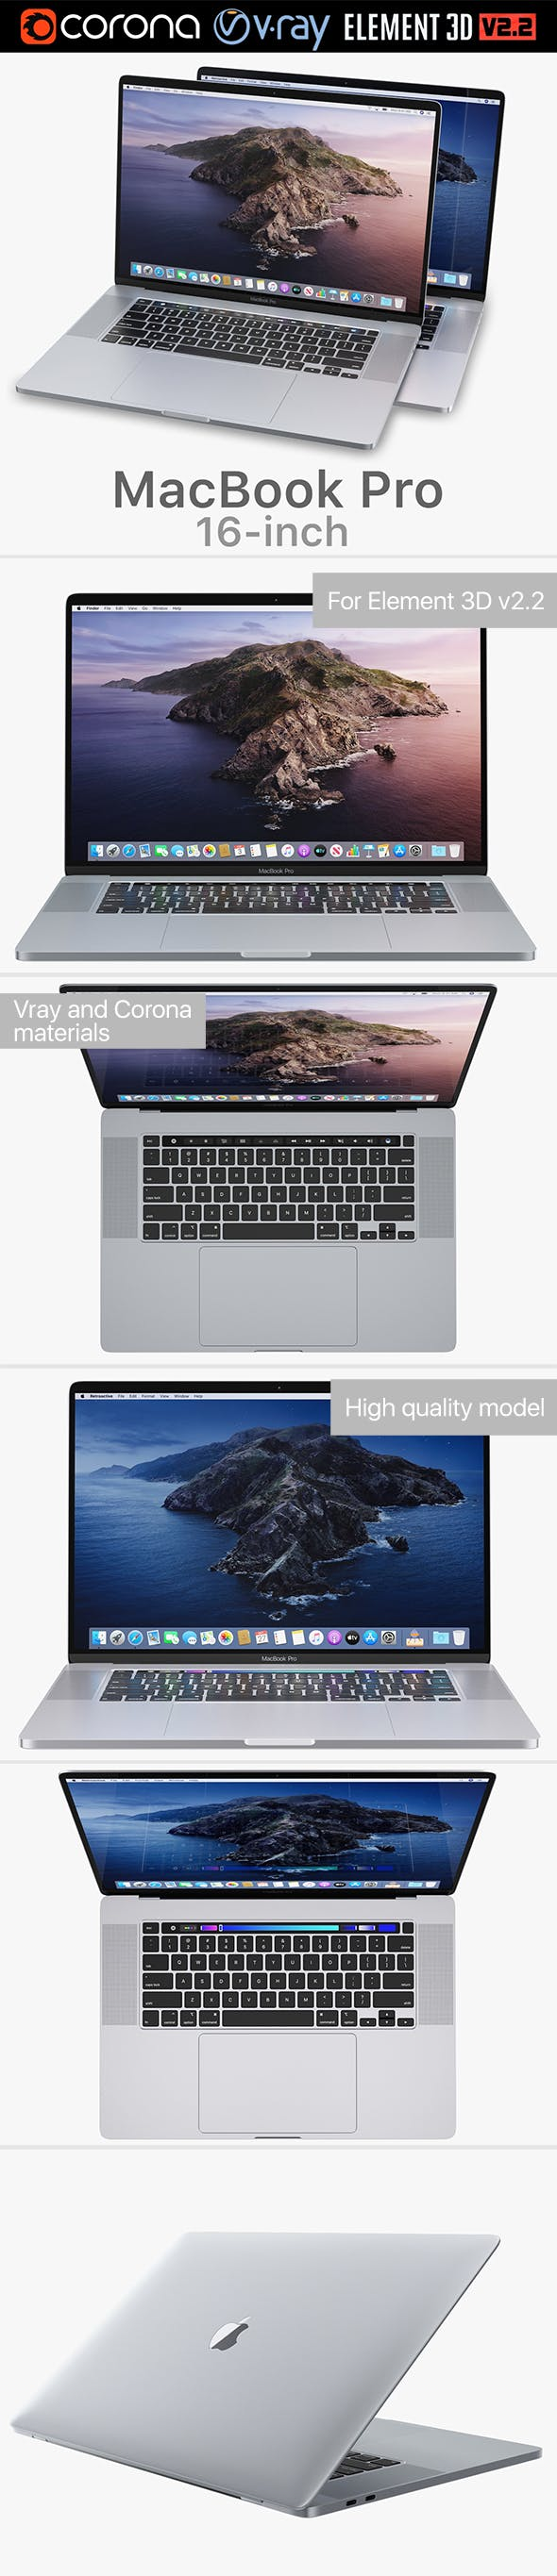 Apple MacBook Pro 16-inch 2019 - 3DOcean Item for Sale